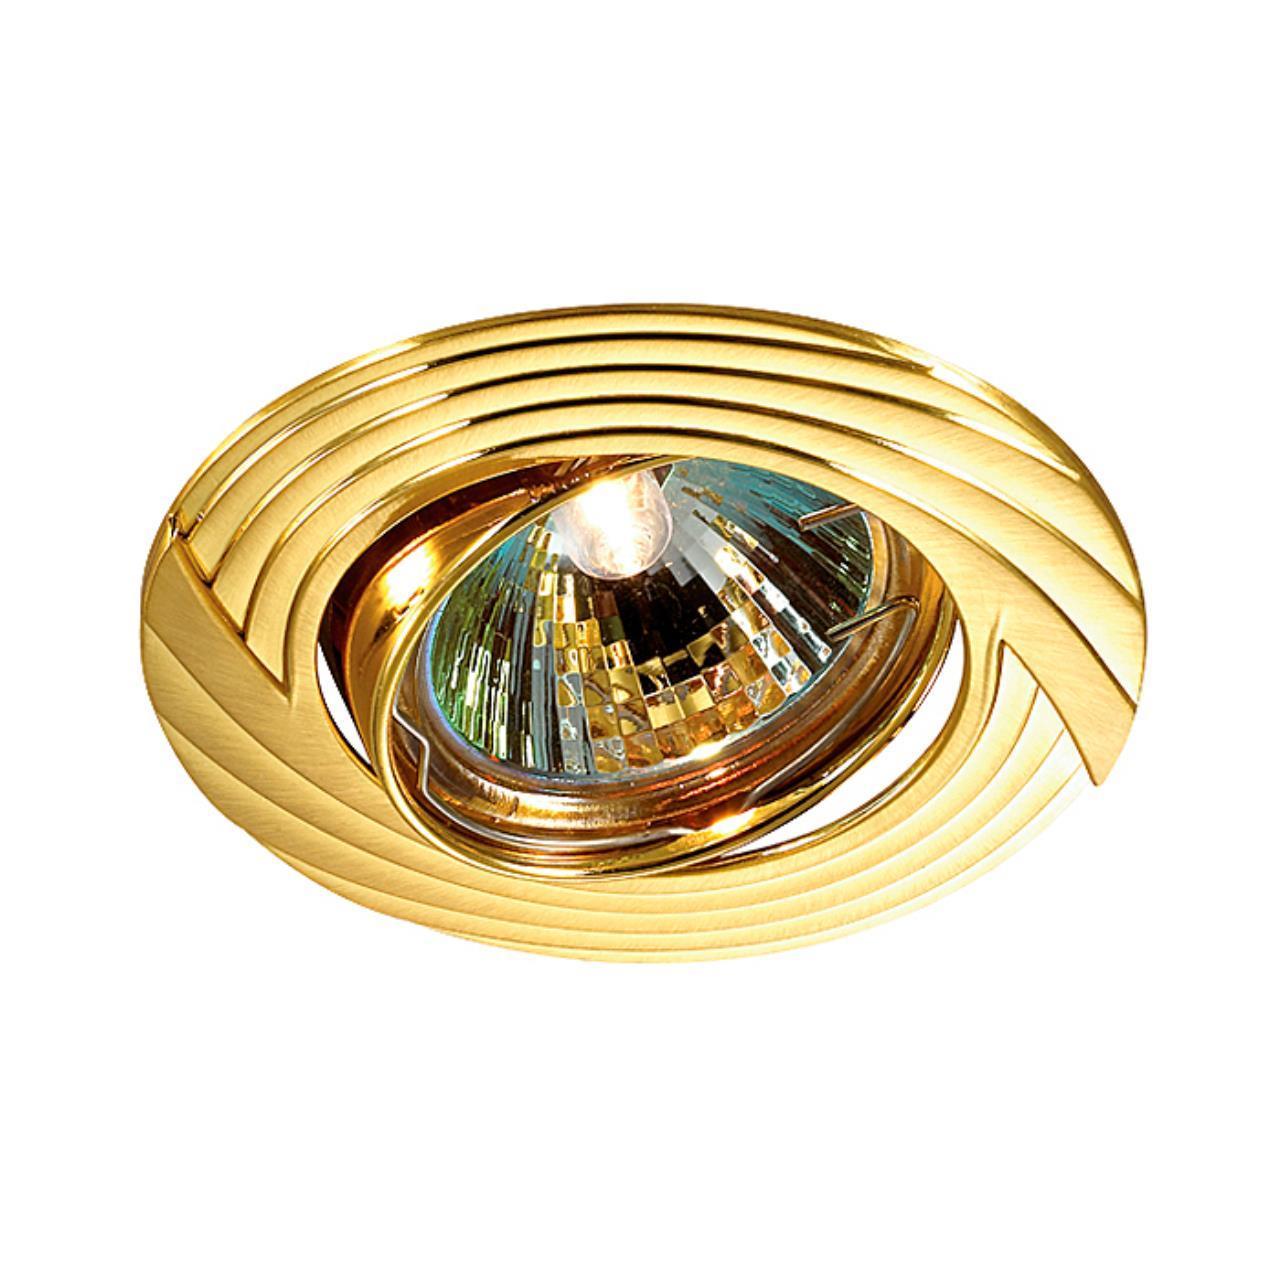 369613 SPOT NT12 134 золото Встраиваемый ПВ светильник IP20 GX5.3 50W 12V TREK